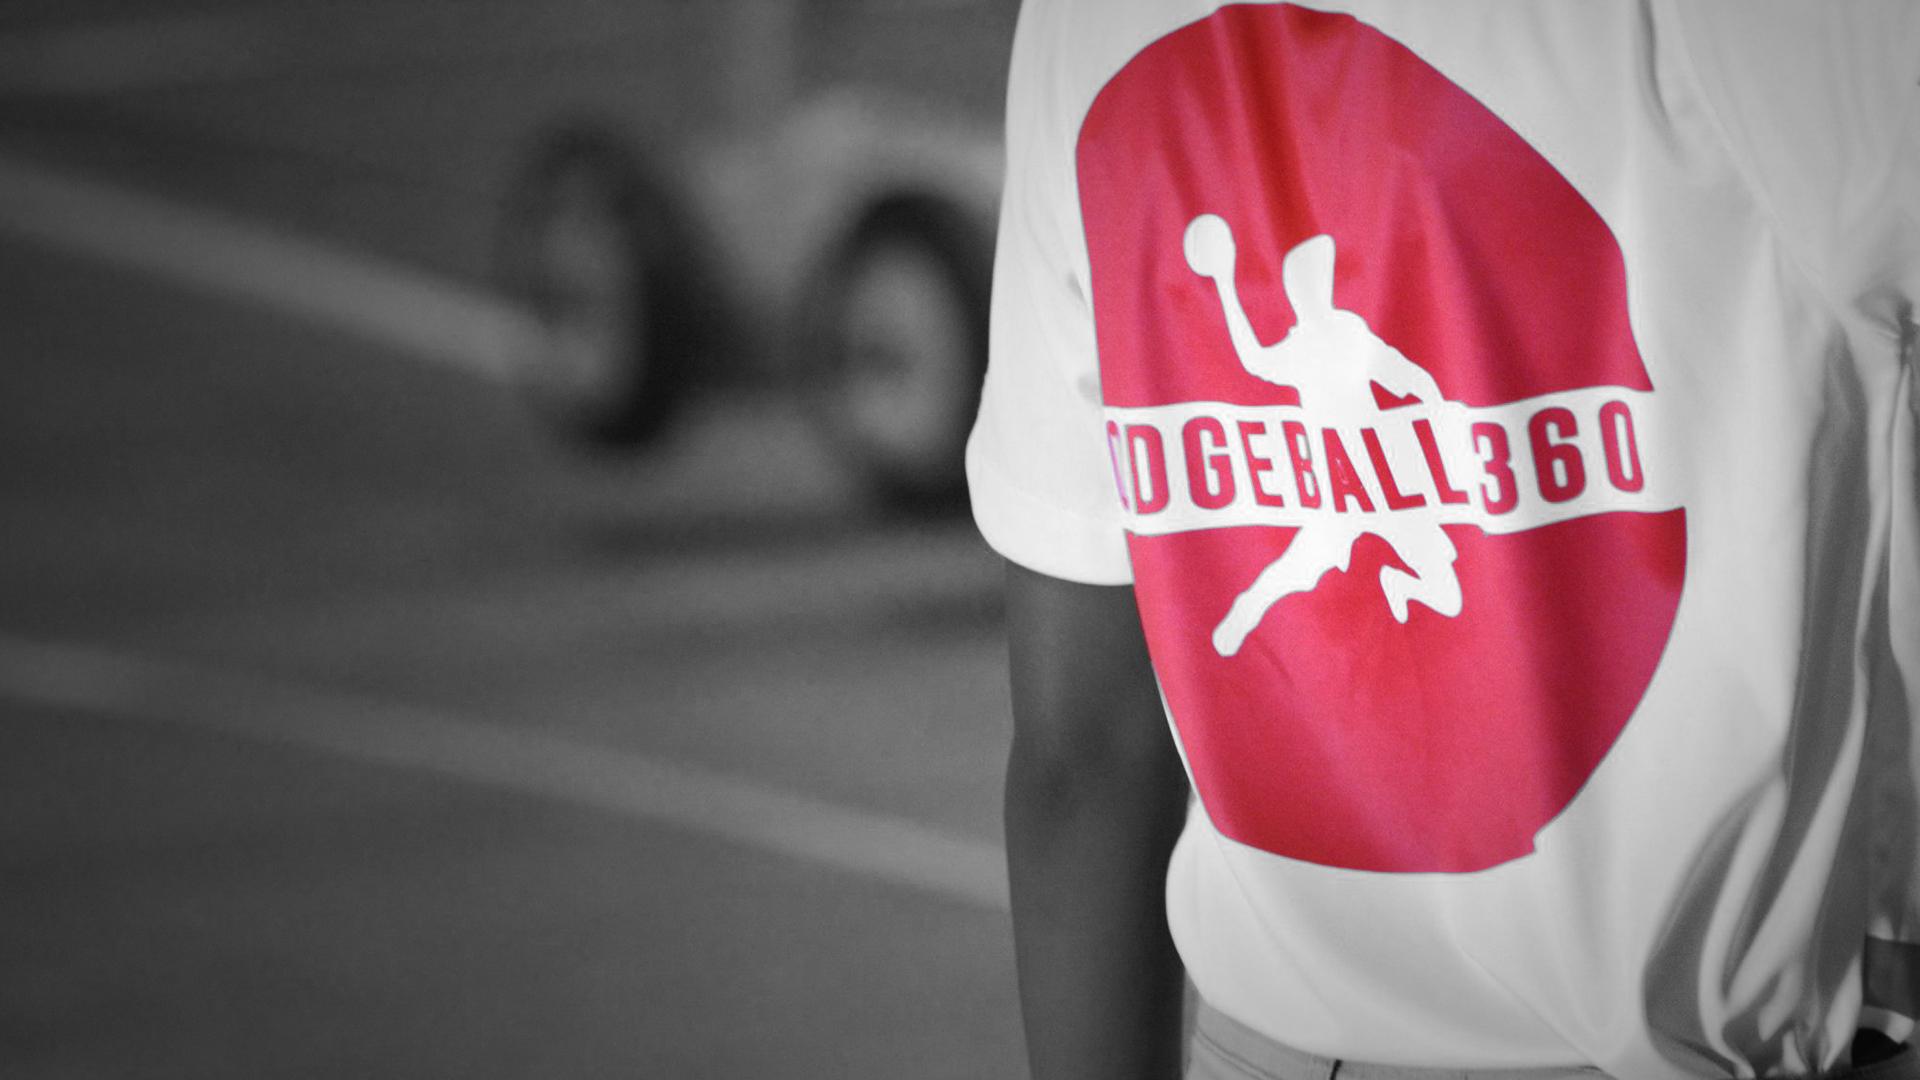 Dodgeball 360